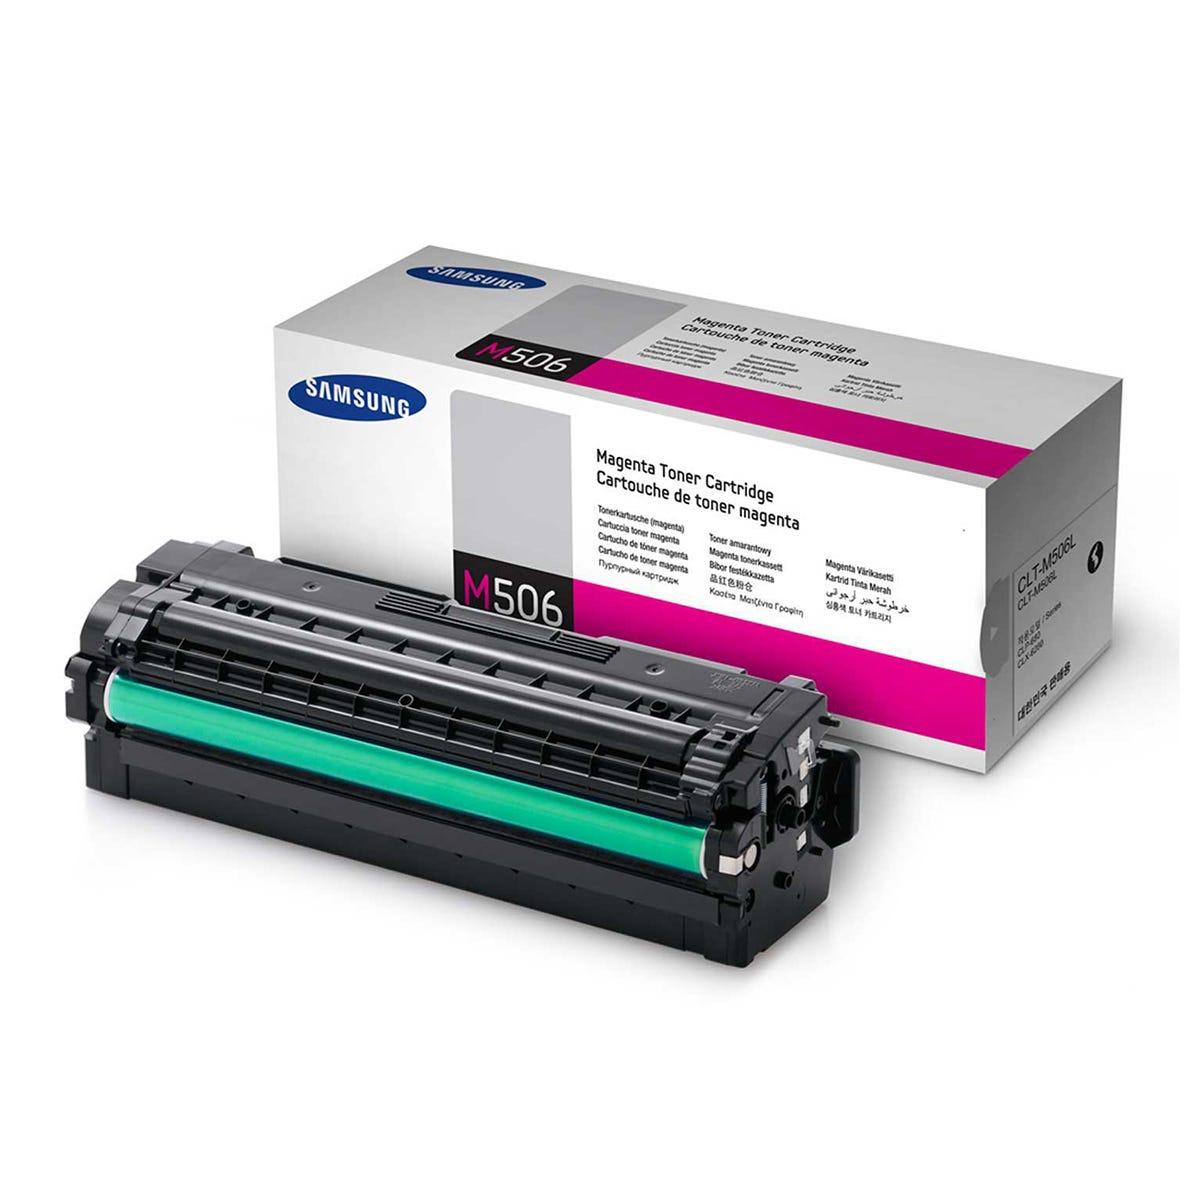 Samsung CLT-506L Inkjet Toner Cartridge, Magenta